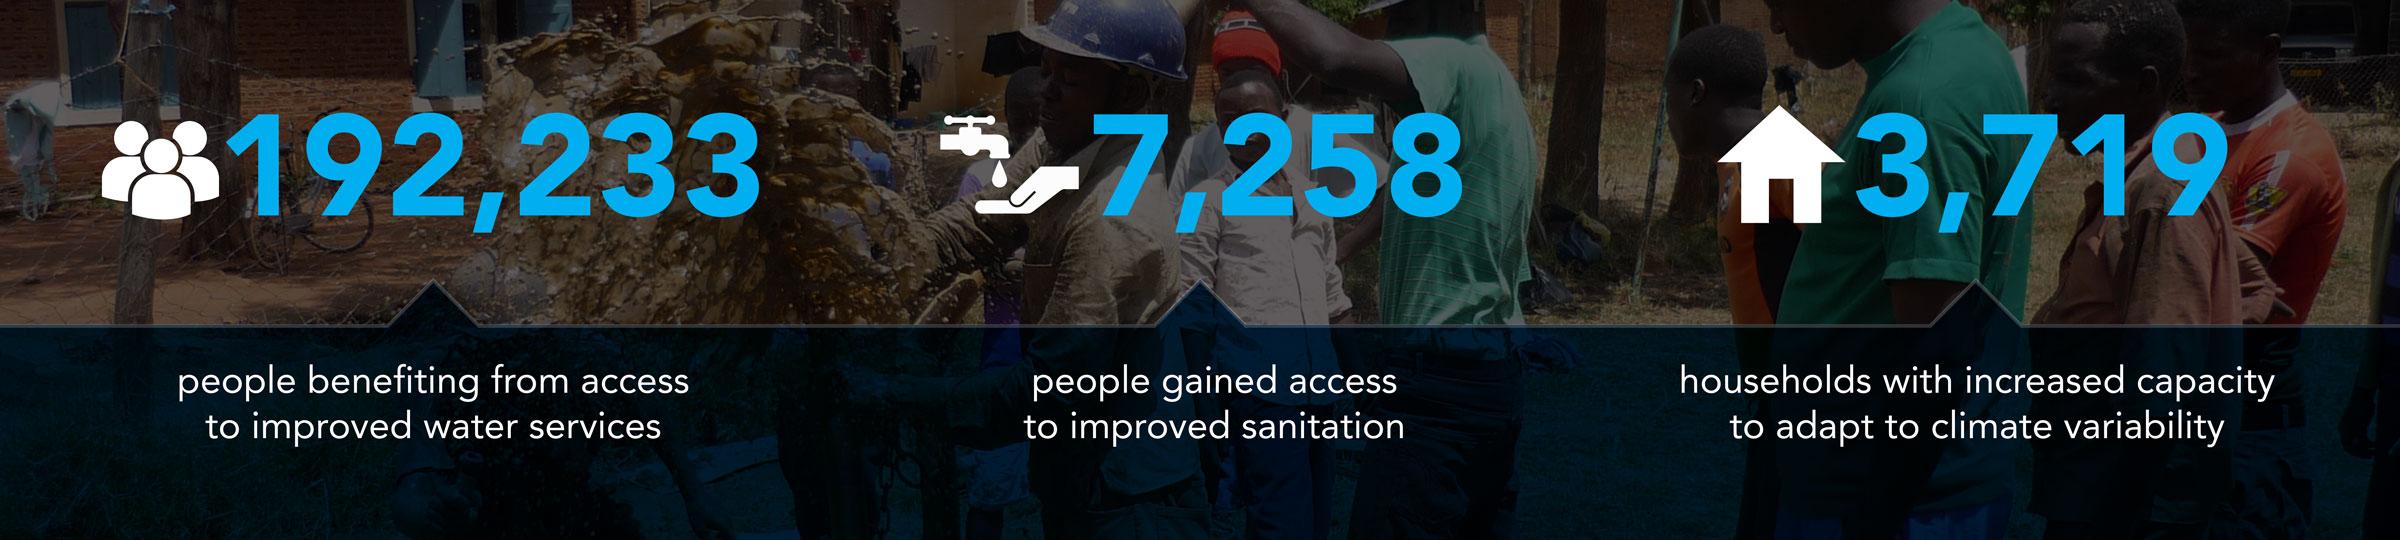 tanzania-web-infographic